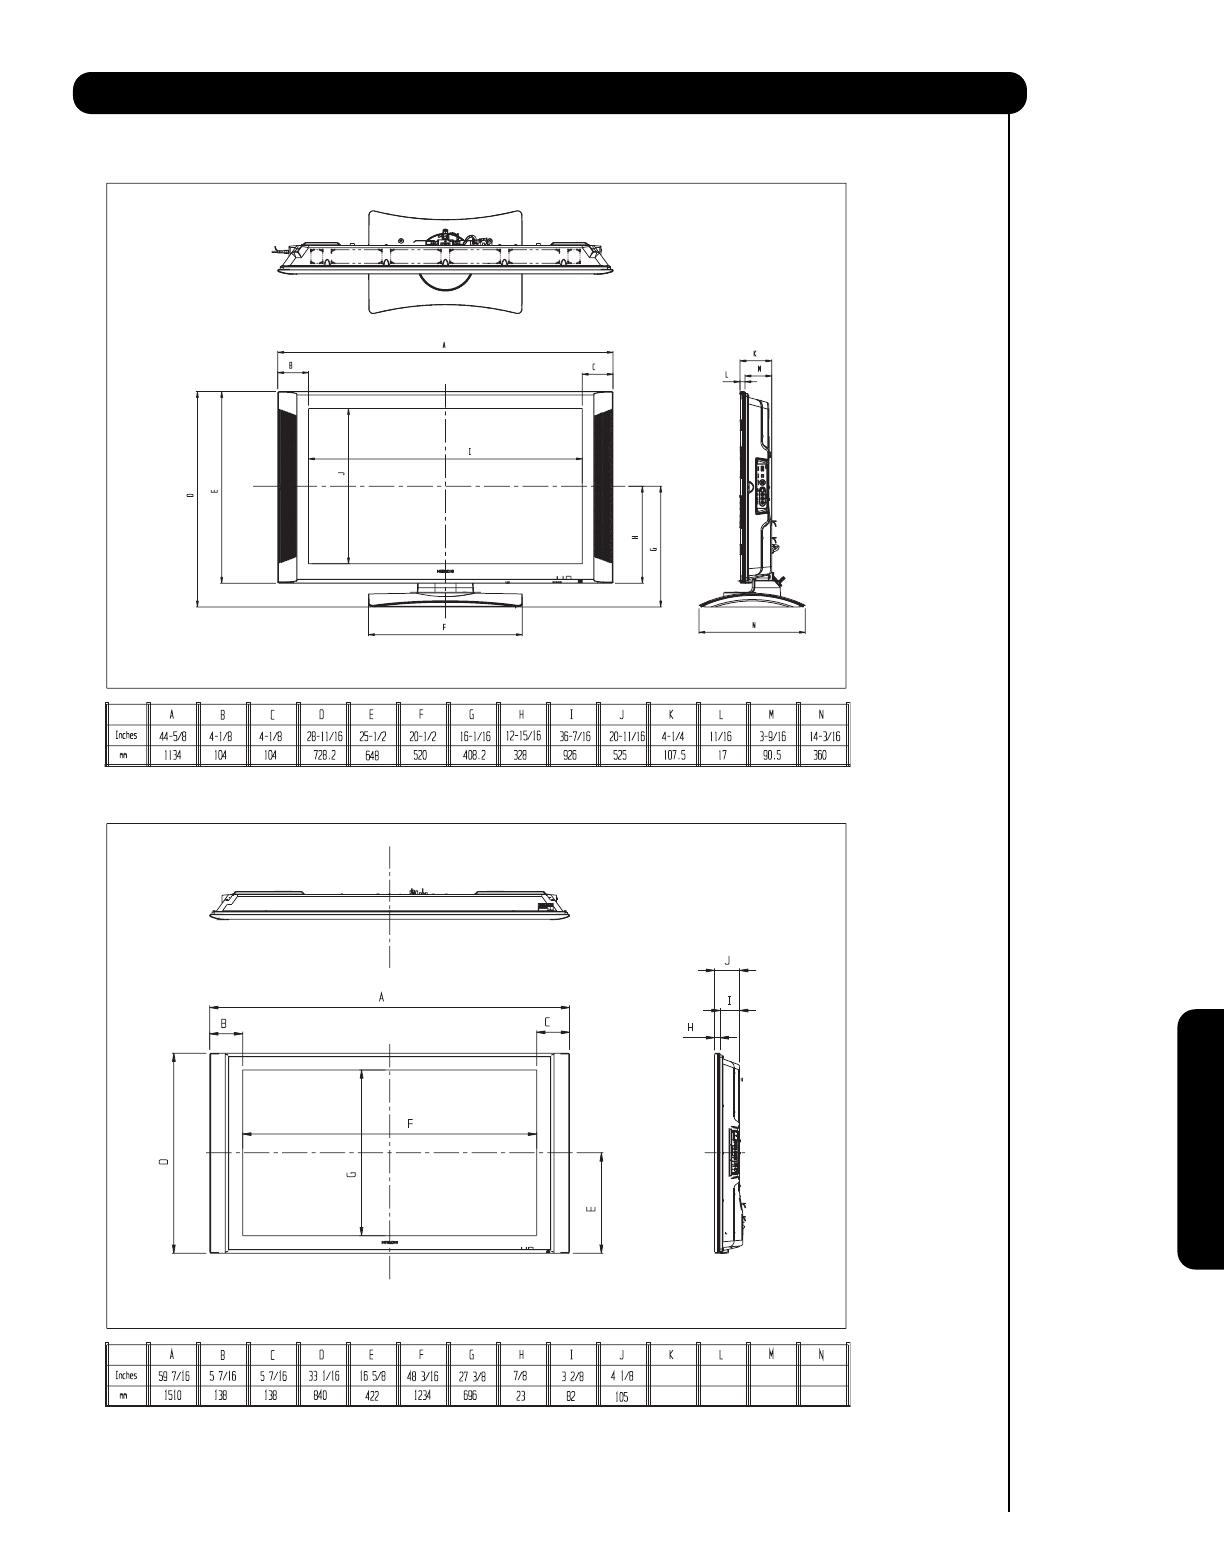 Hitachi 55Hdt52 Users Manual